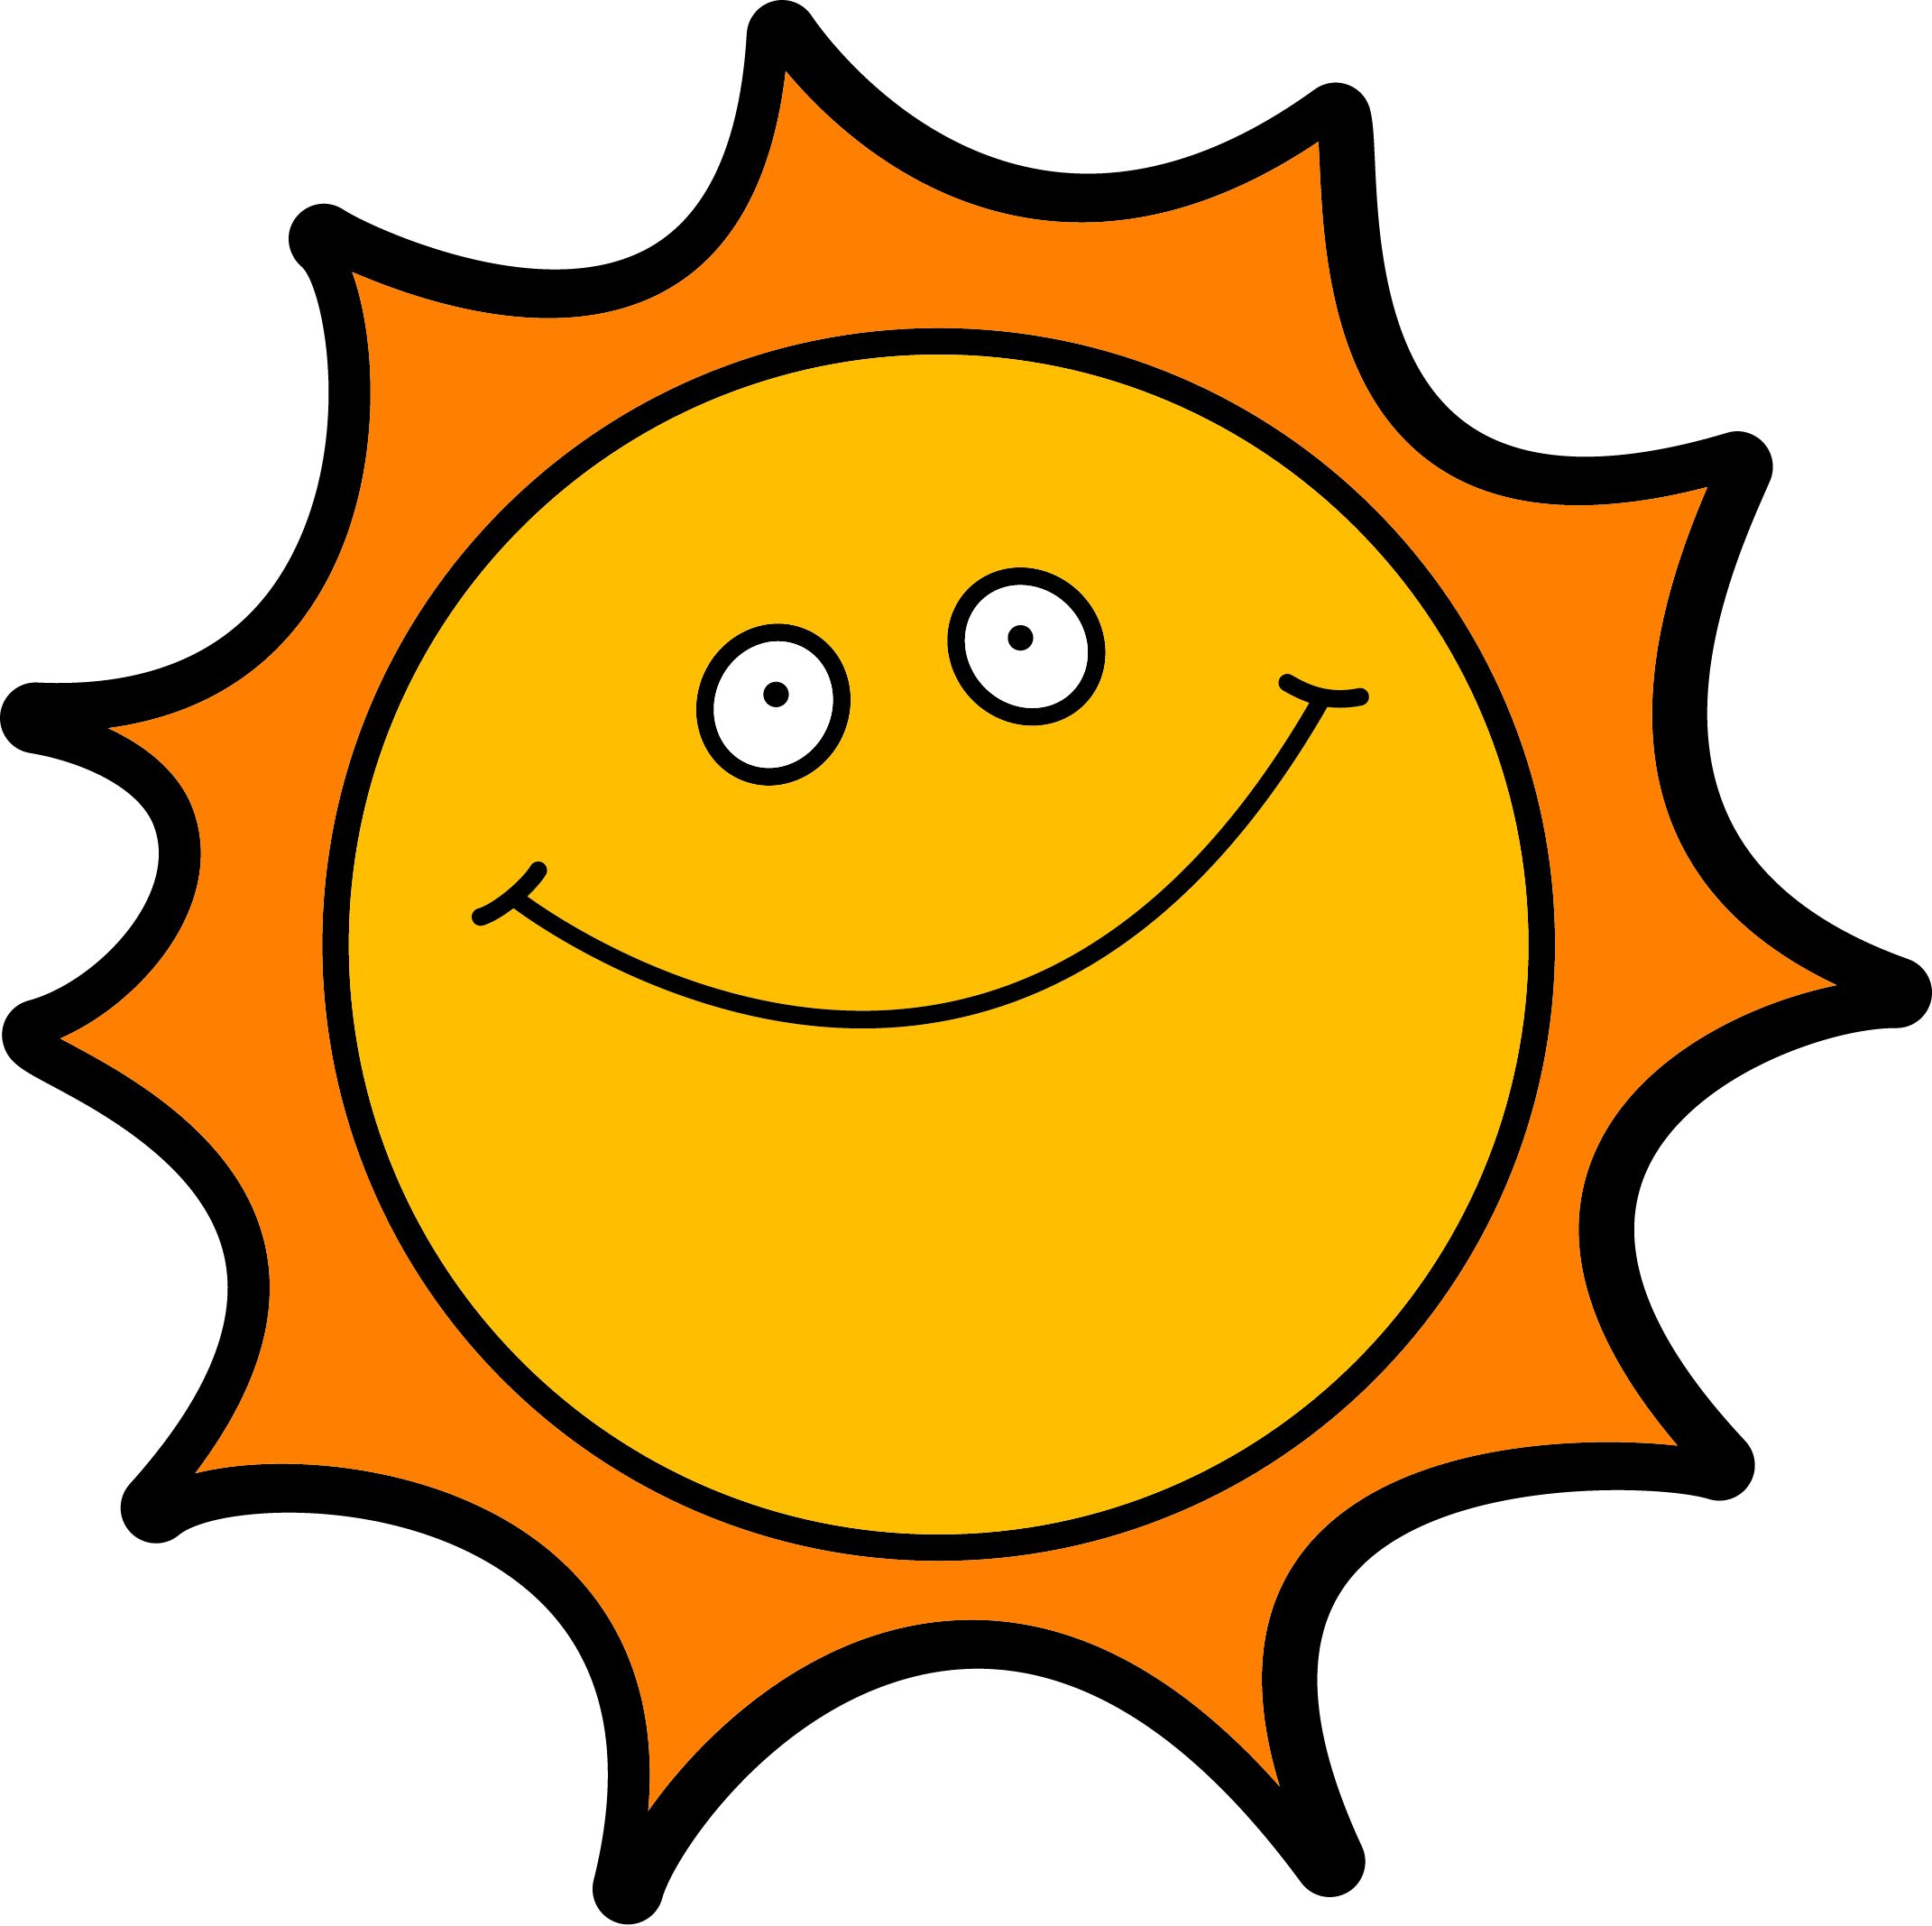 2142x2135 Sunshine Free Sun Clipart Public Domain Clip Art Images And 3